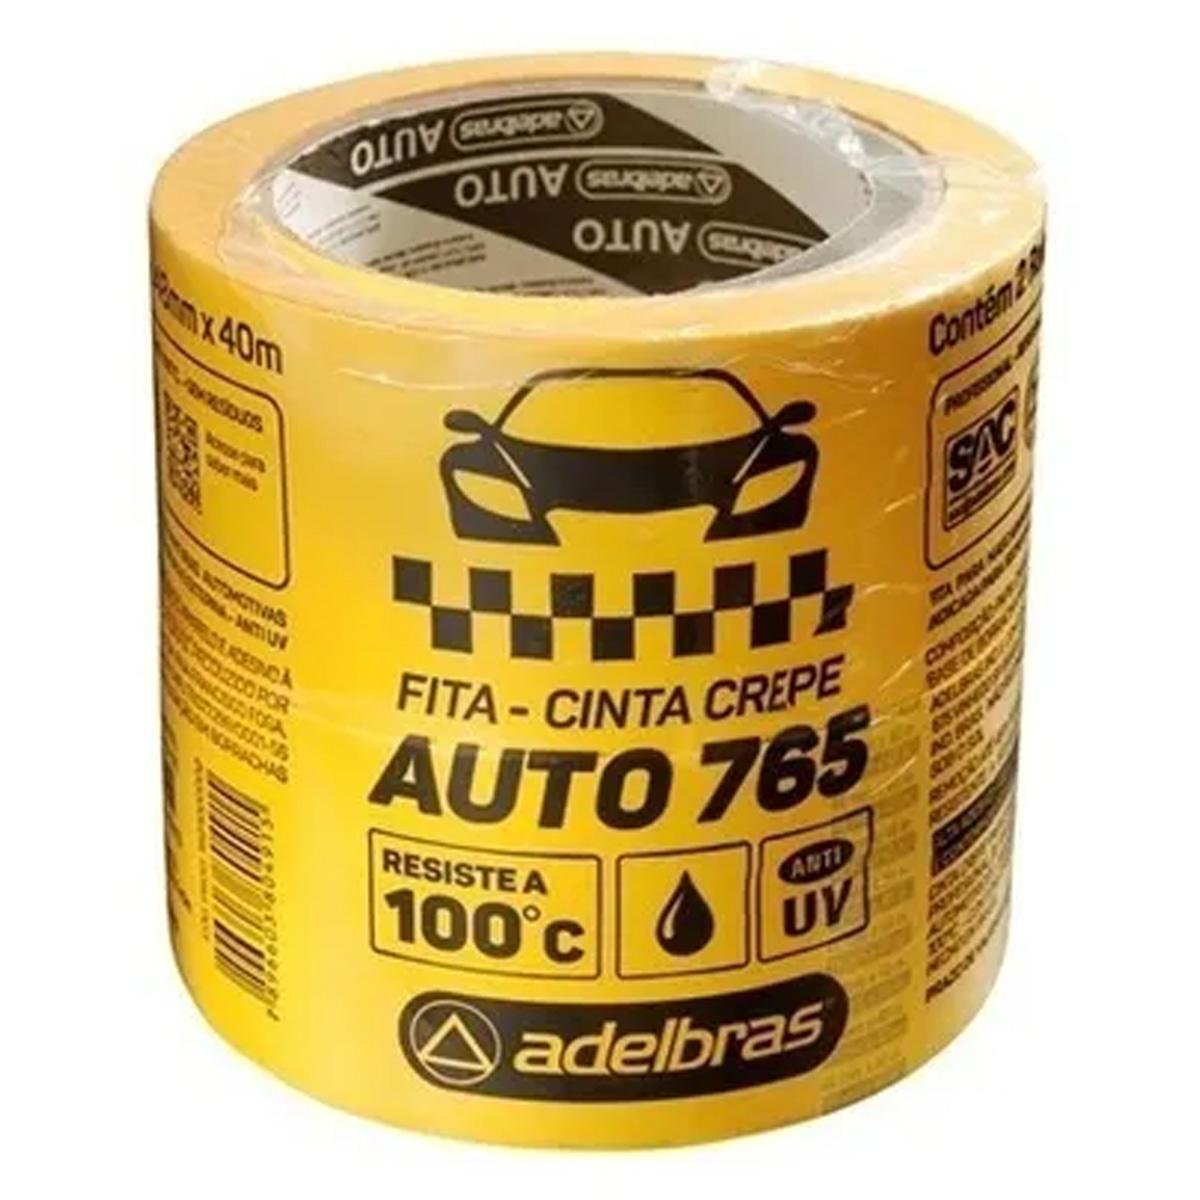 Fita Crepe Automotiva Anti UV Amarela 48mm x 40mt - Adelbras  - RS Som e Luz!